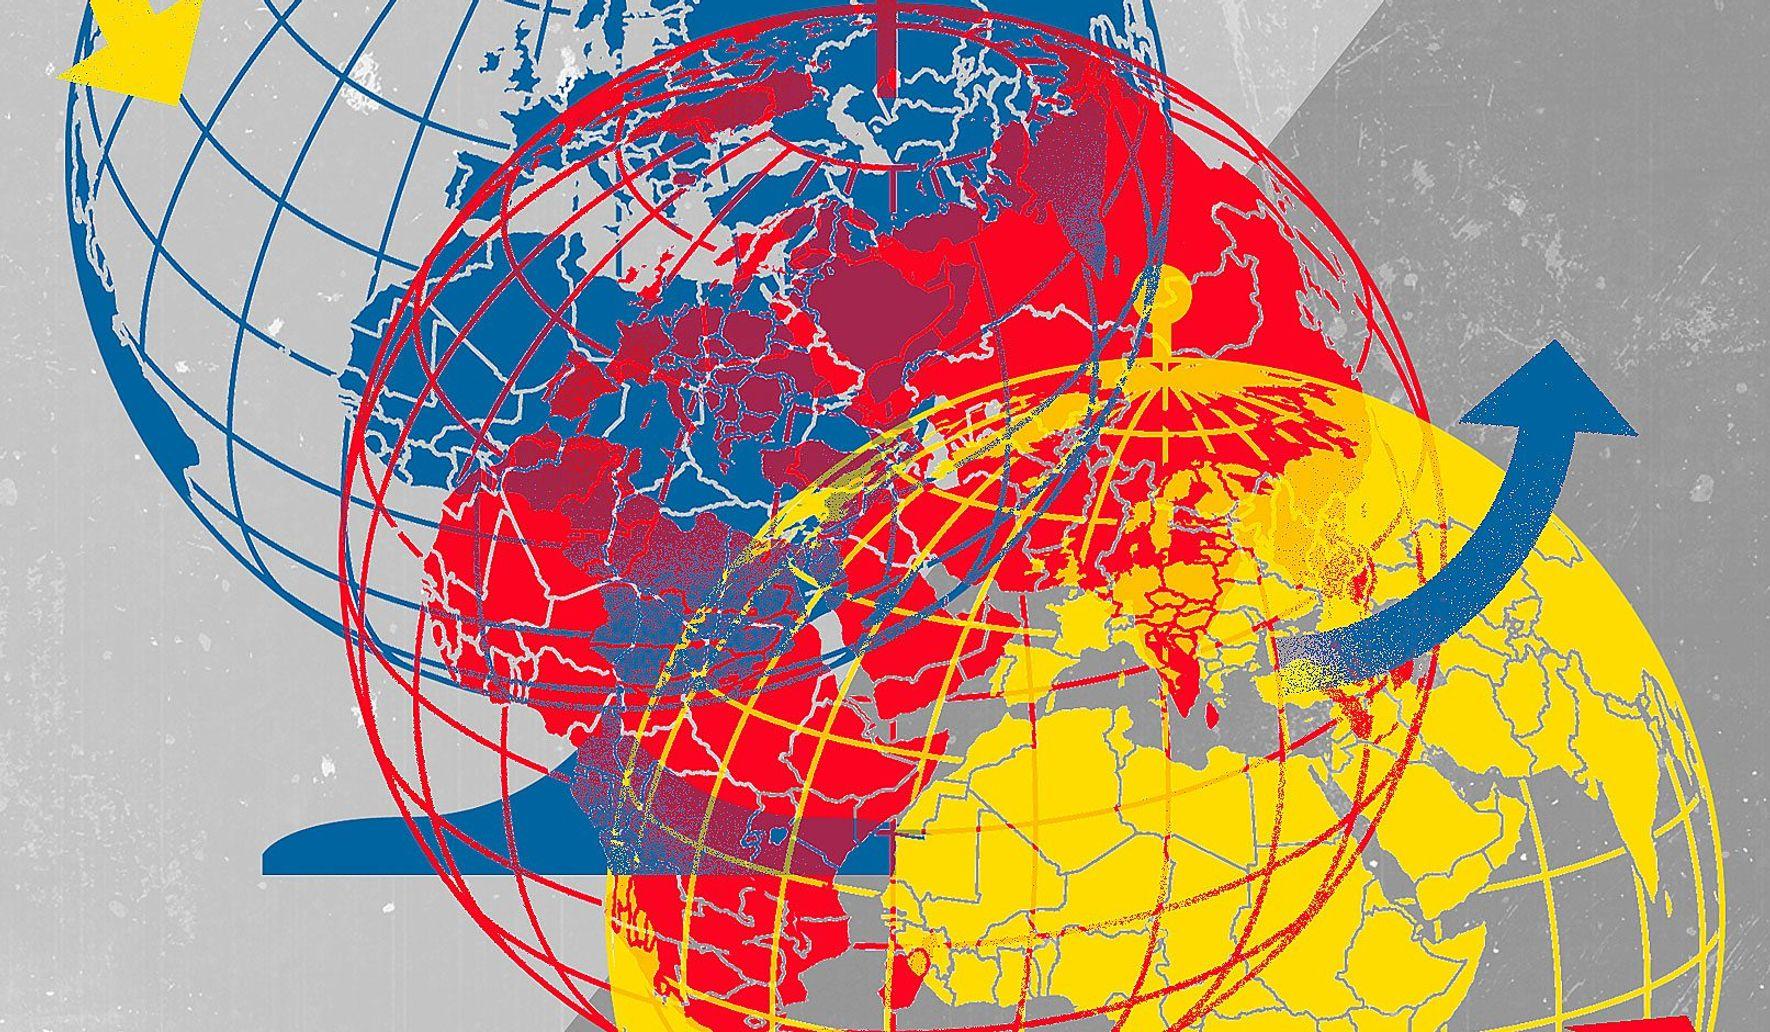 U.S. intervention realities in the Global War on Terror